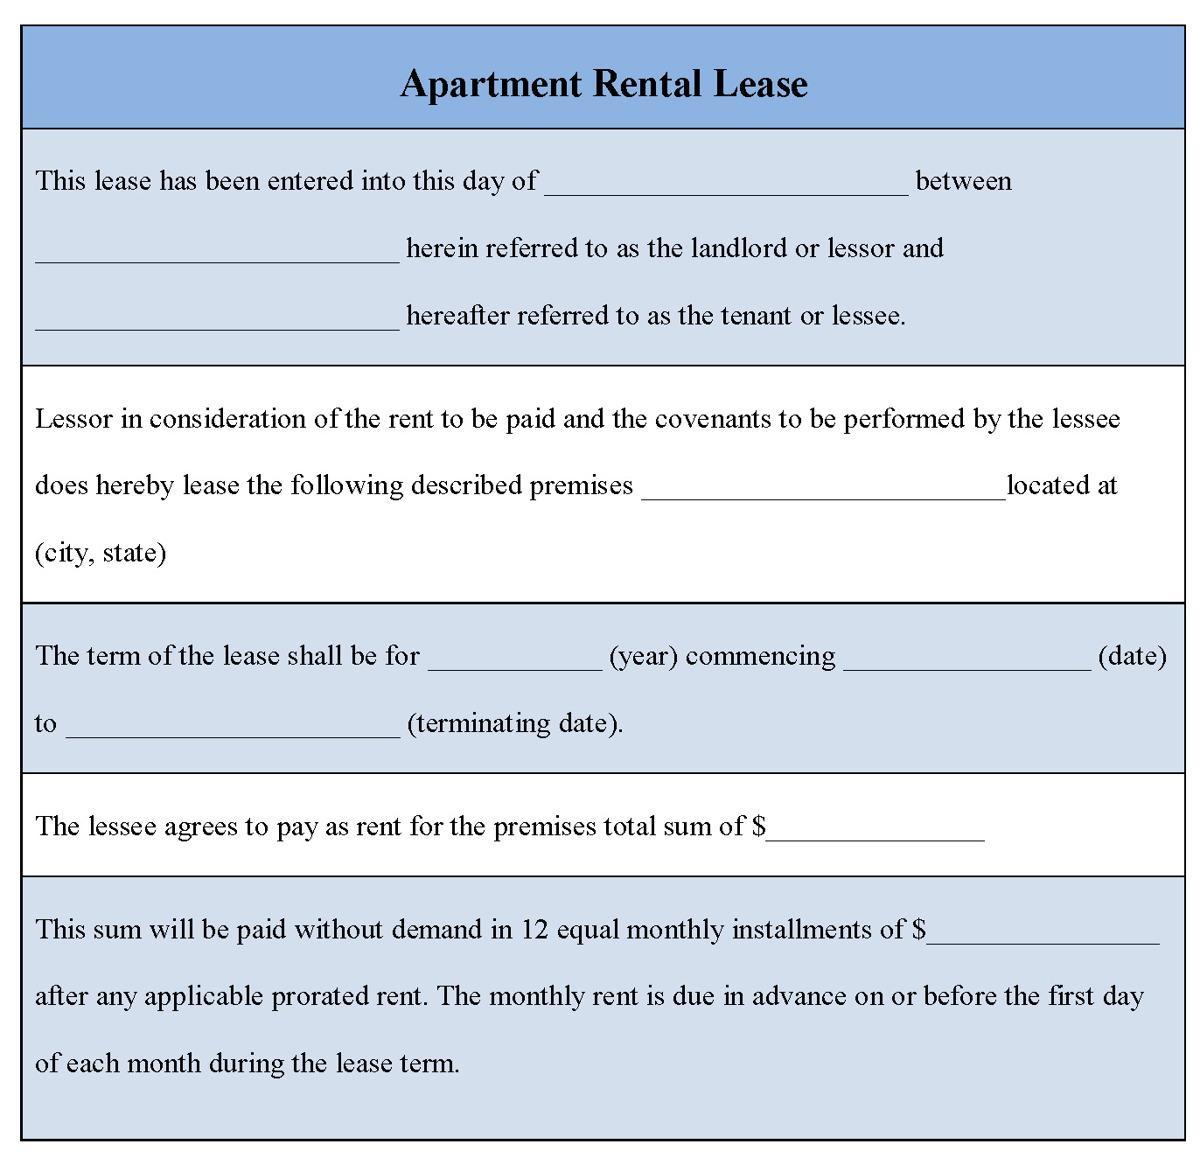 Apartment Rental Lease Document